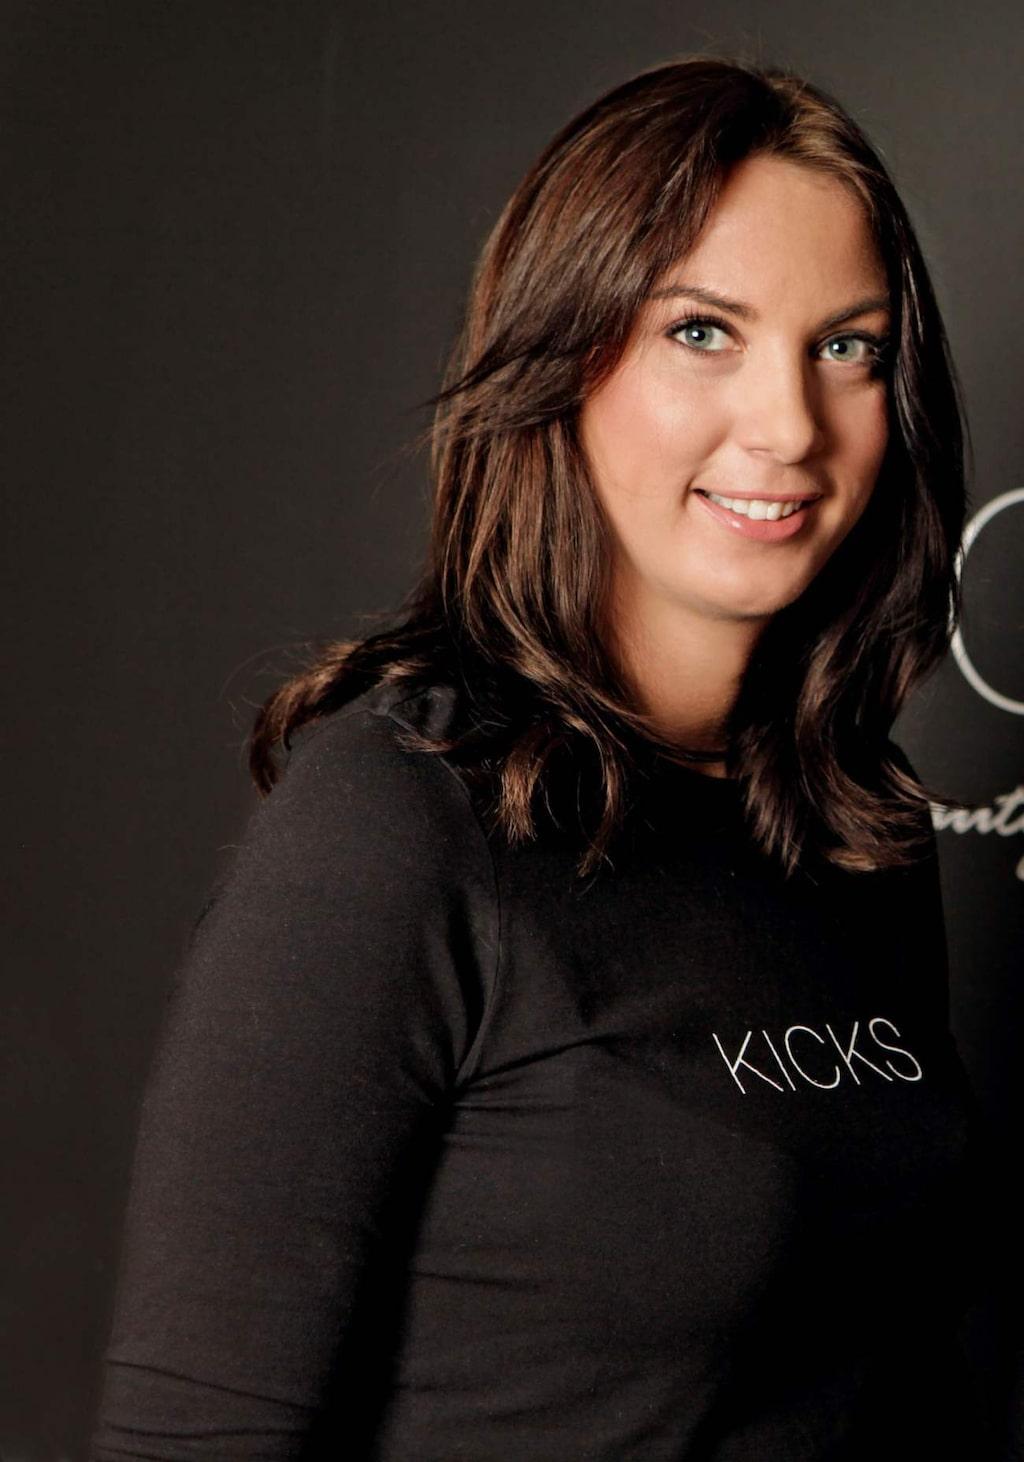 <p>Petra Jansdotter, makeup-artist på Kicks.</p>